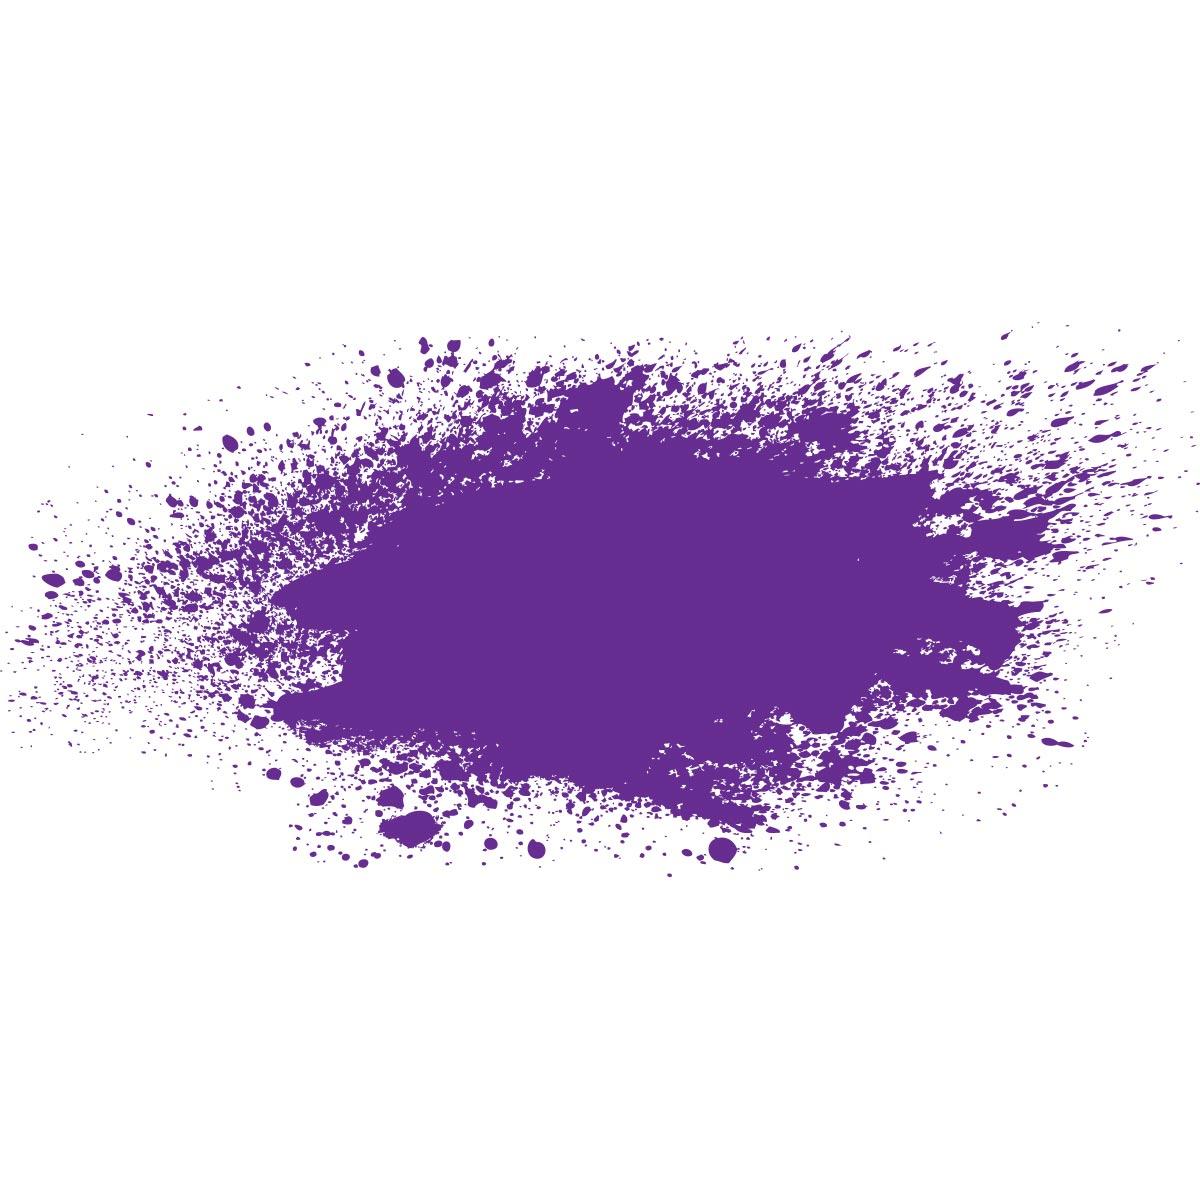 FolkArt ® Stencil Spray™ Acrylic Paint - Purple, 2 oz.